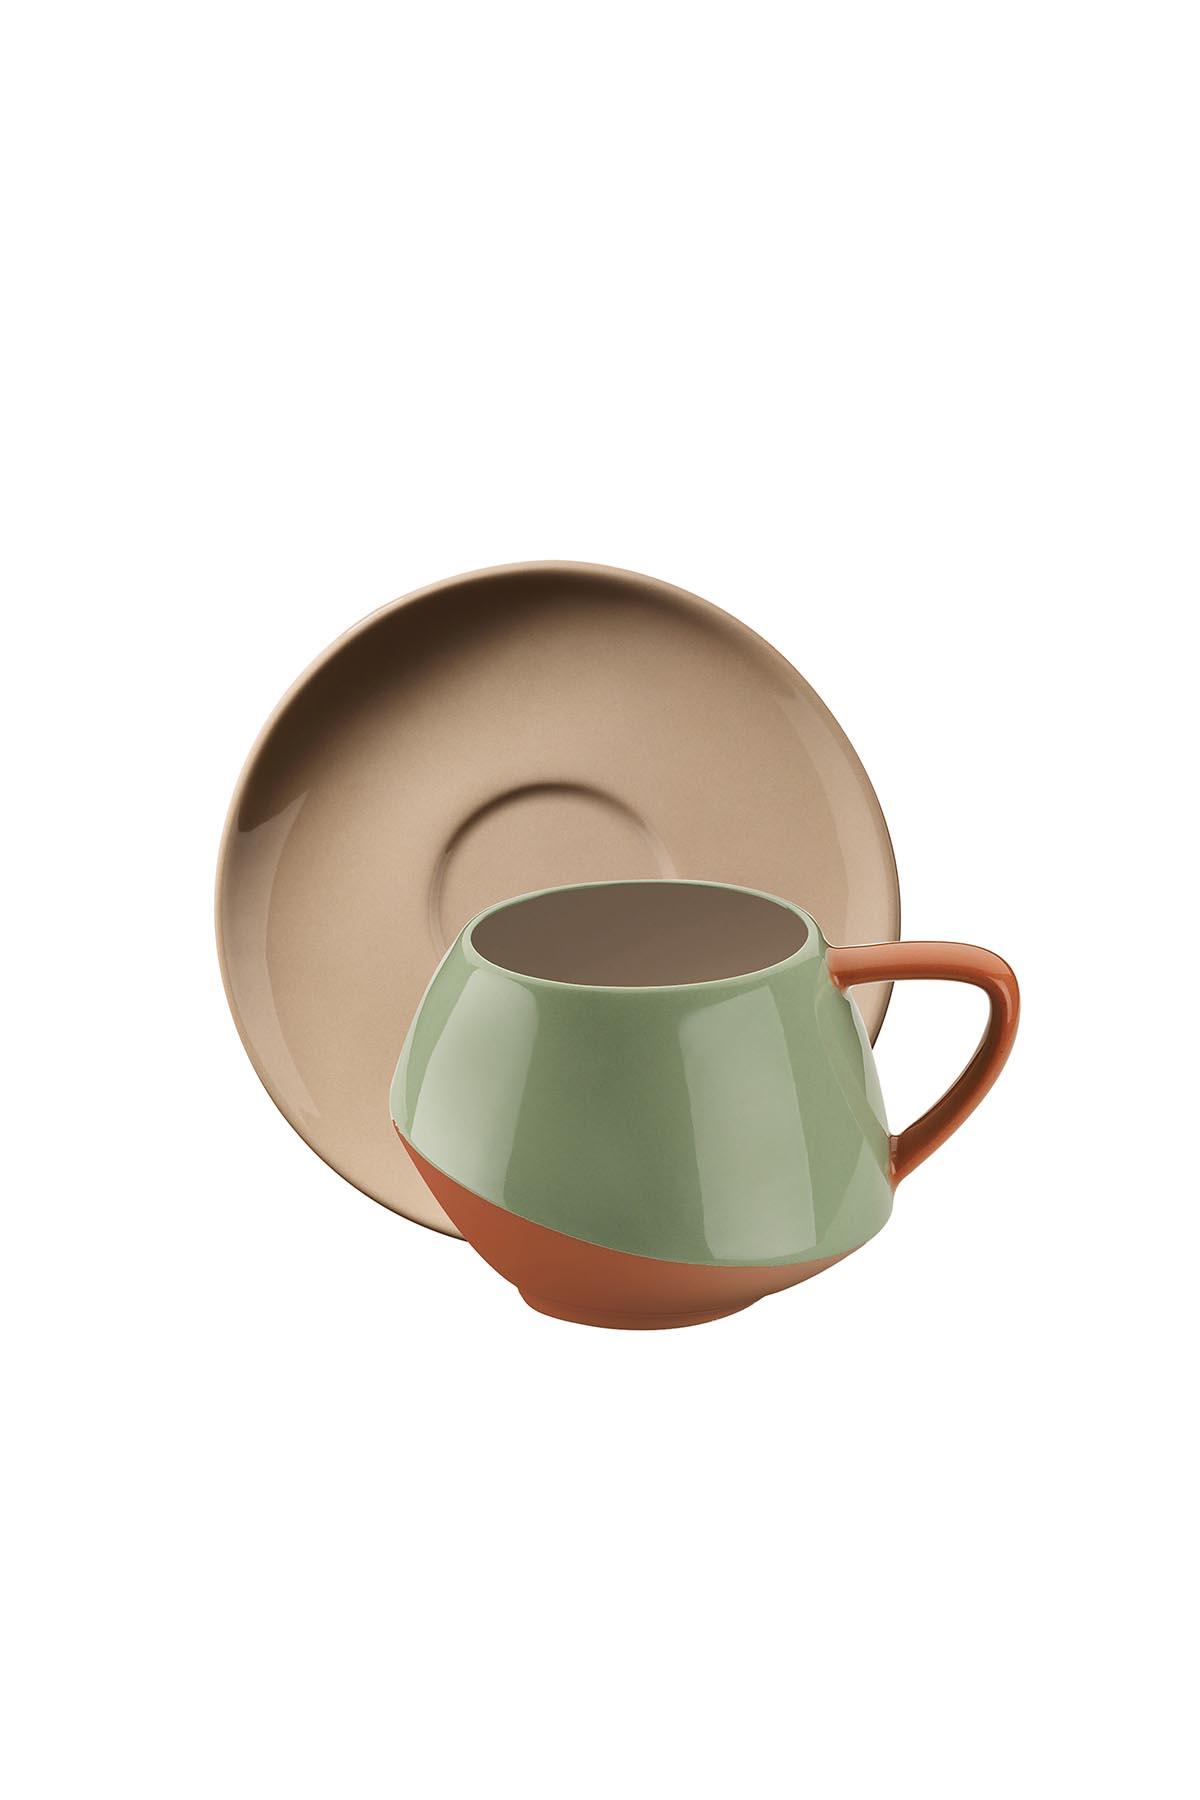 Aura Çay Takımı Yeşil-Bej-Kırmızı